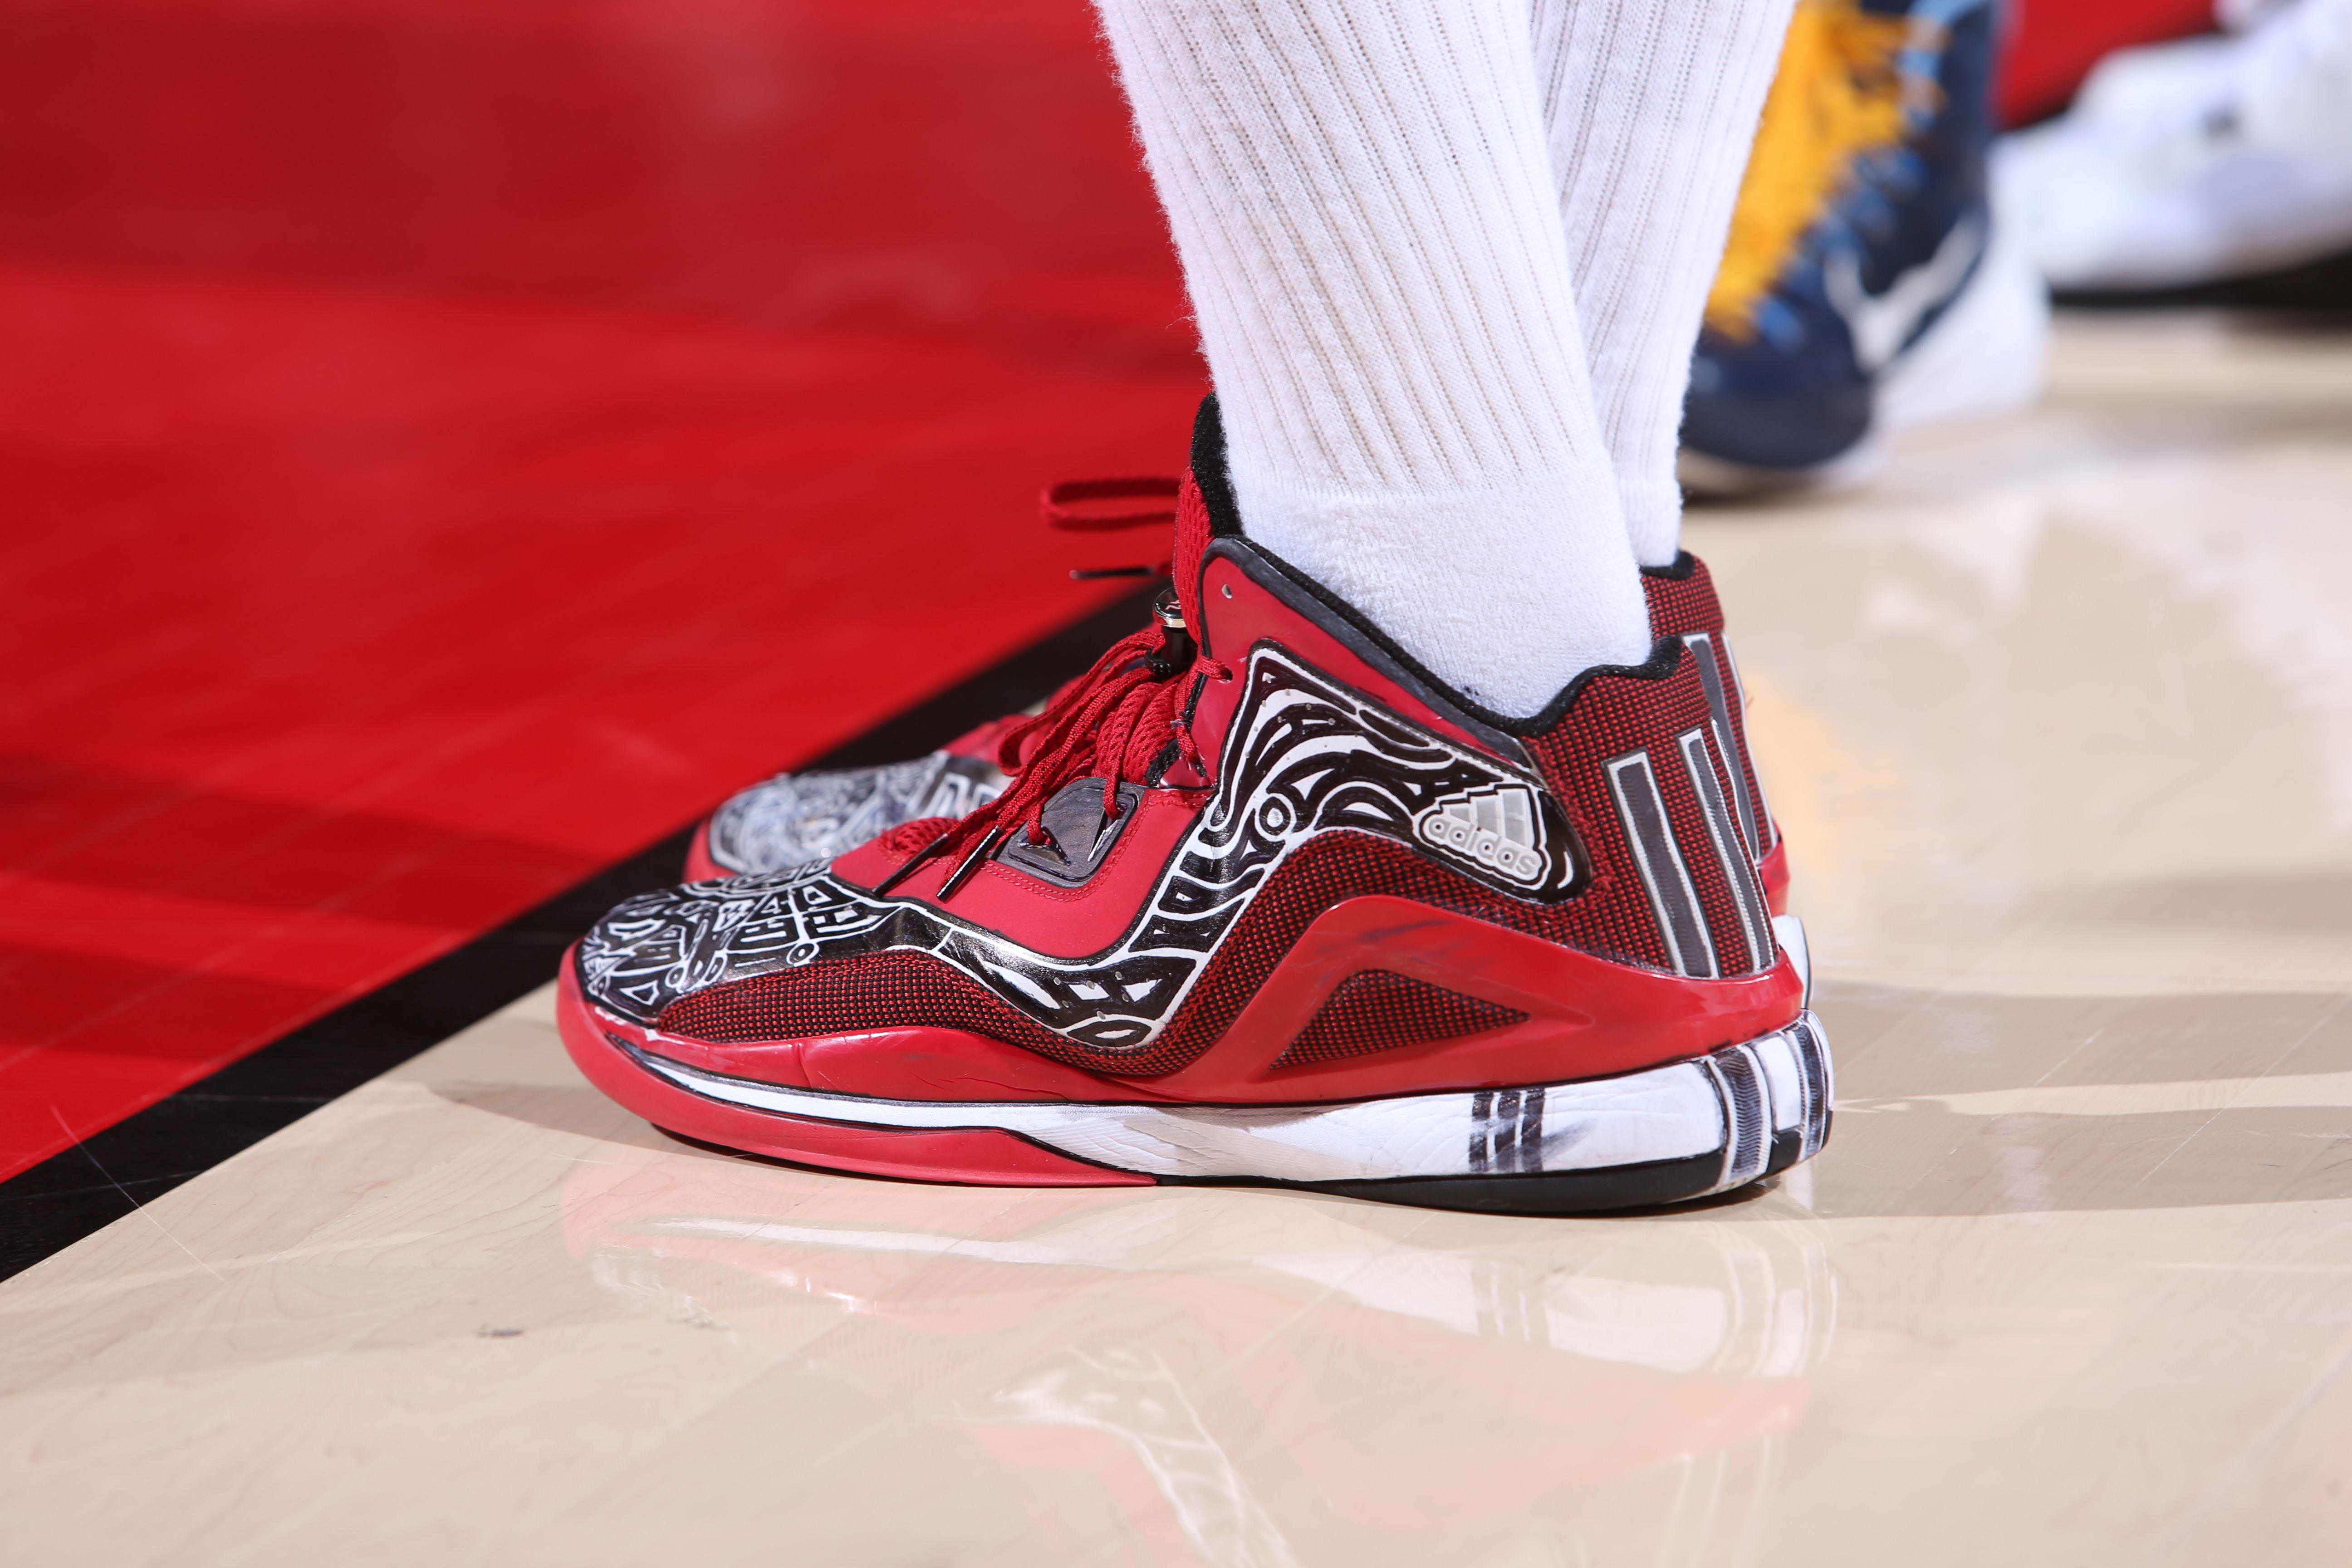 Adidas Celtics Shoes | Home > Adidas NBA Shoes > Adidas NBA